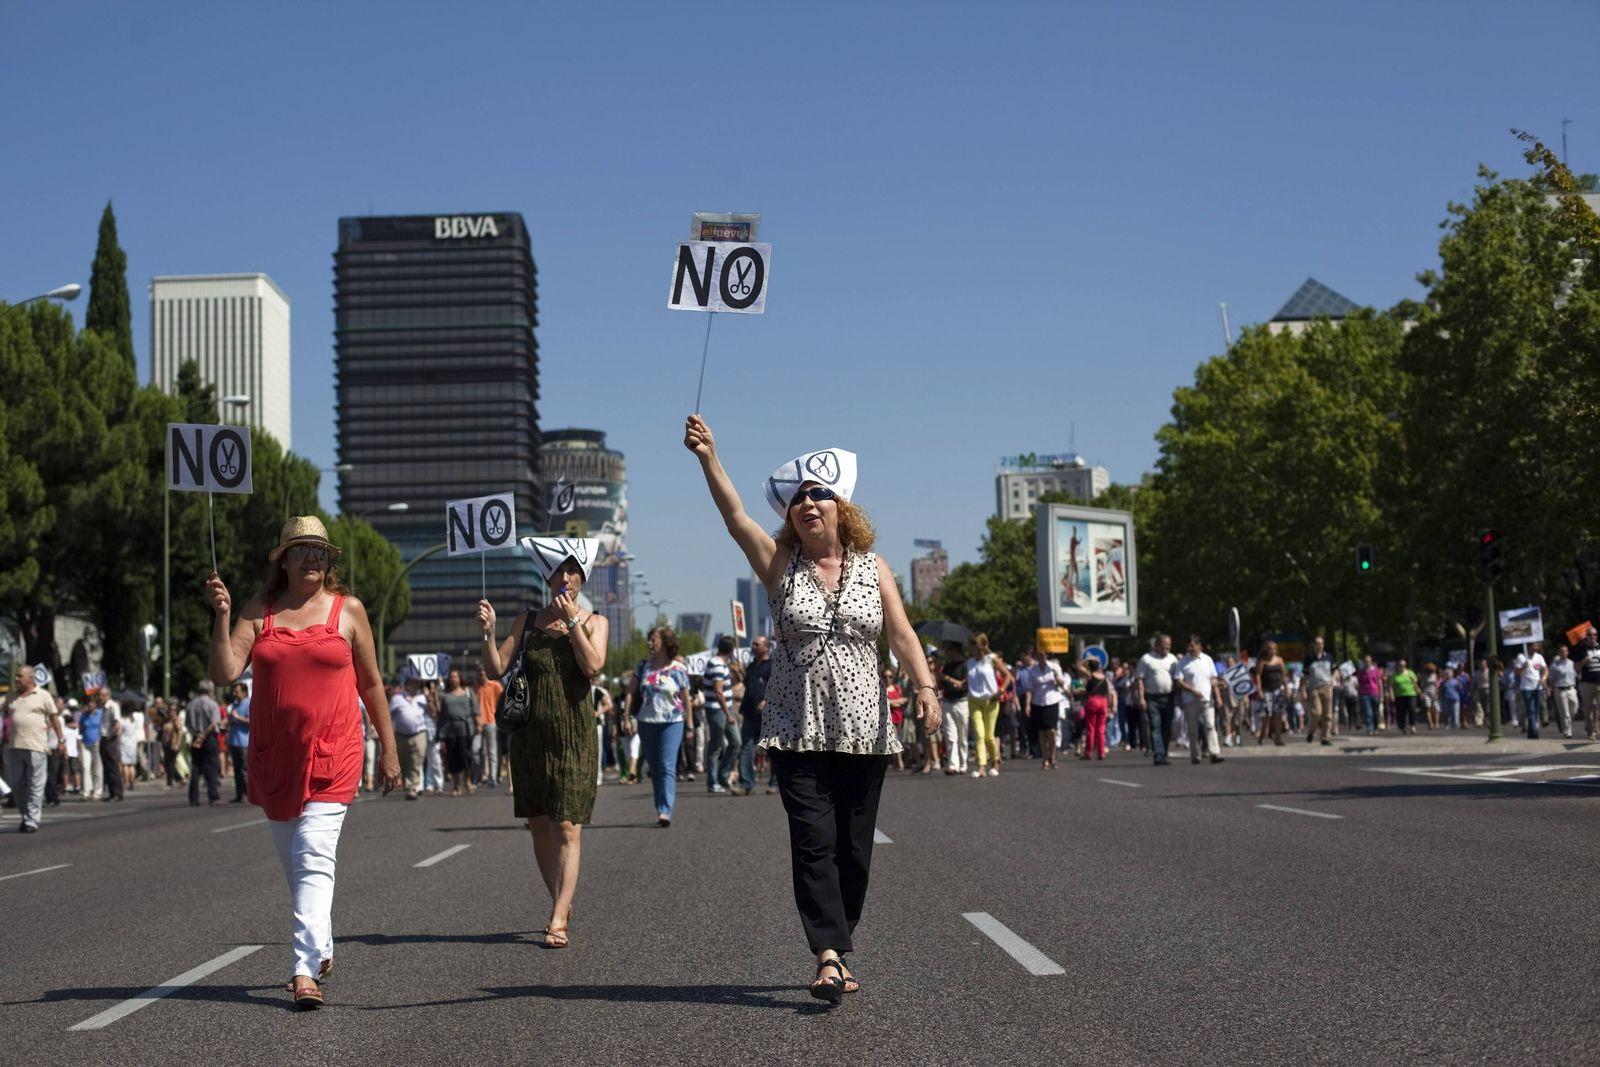 Spanien / Protest